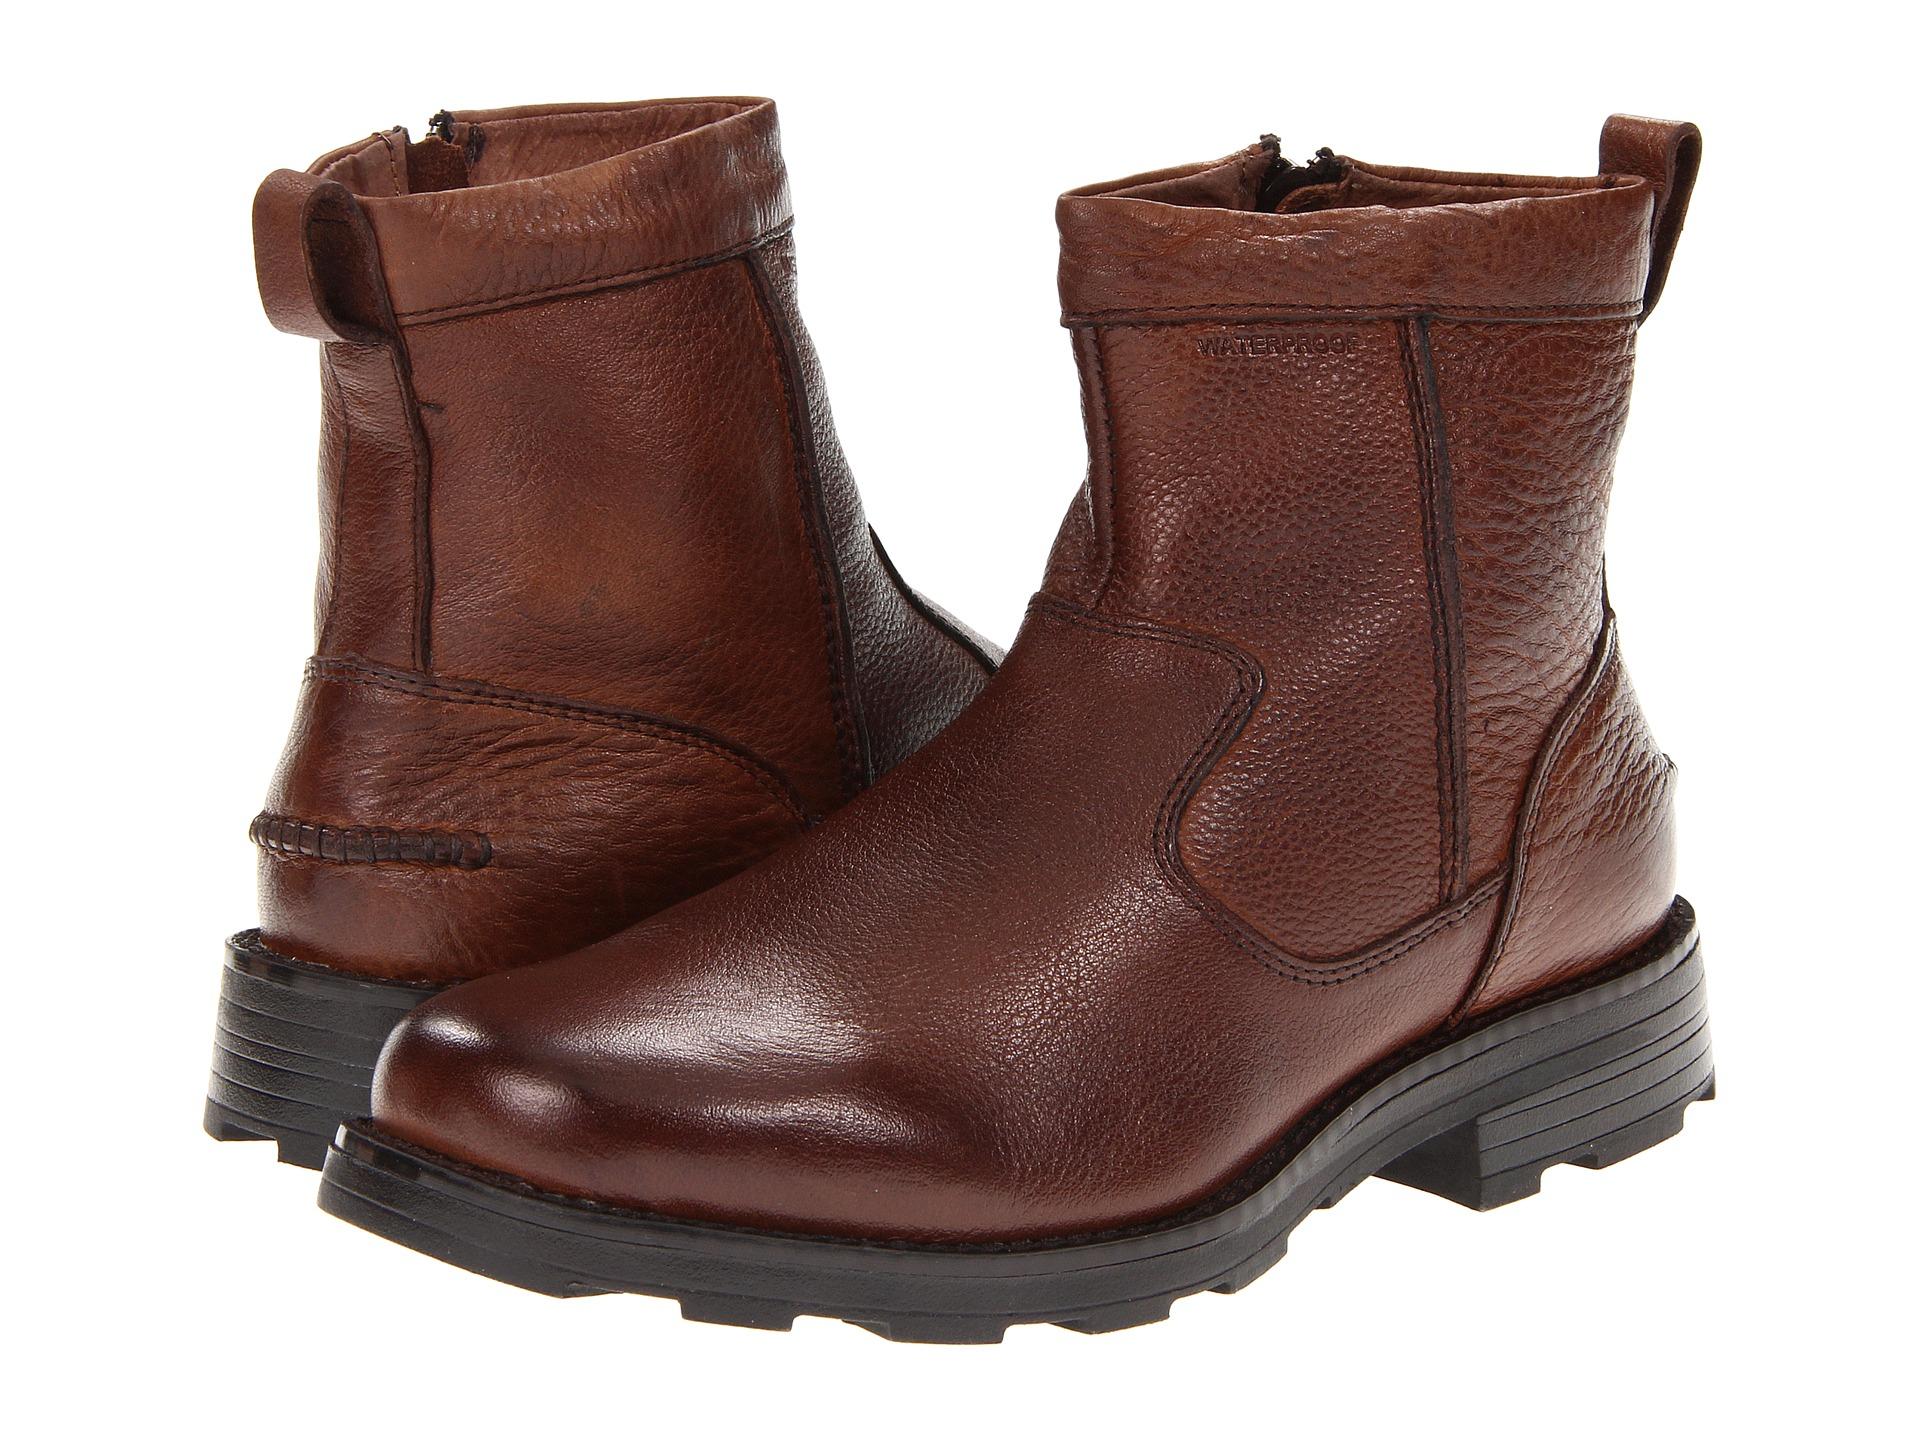 florsheim trektion boot brown zappos free shipping